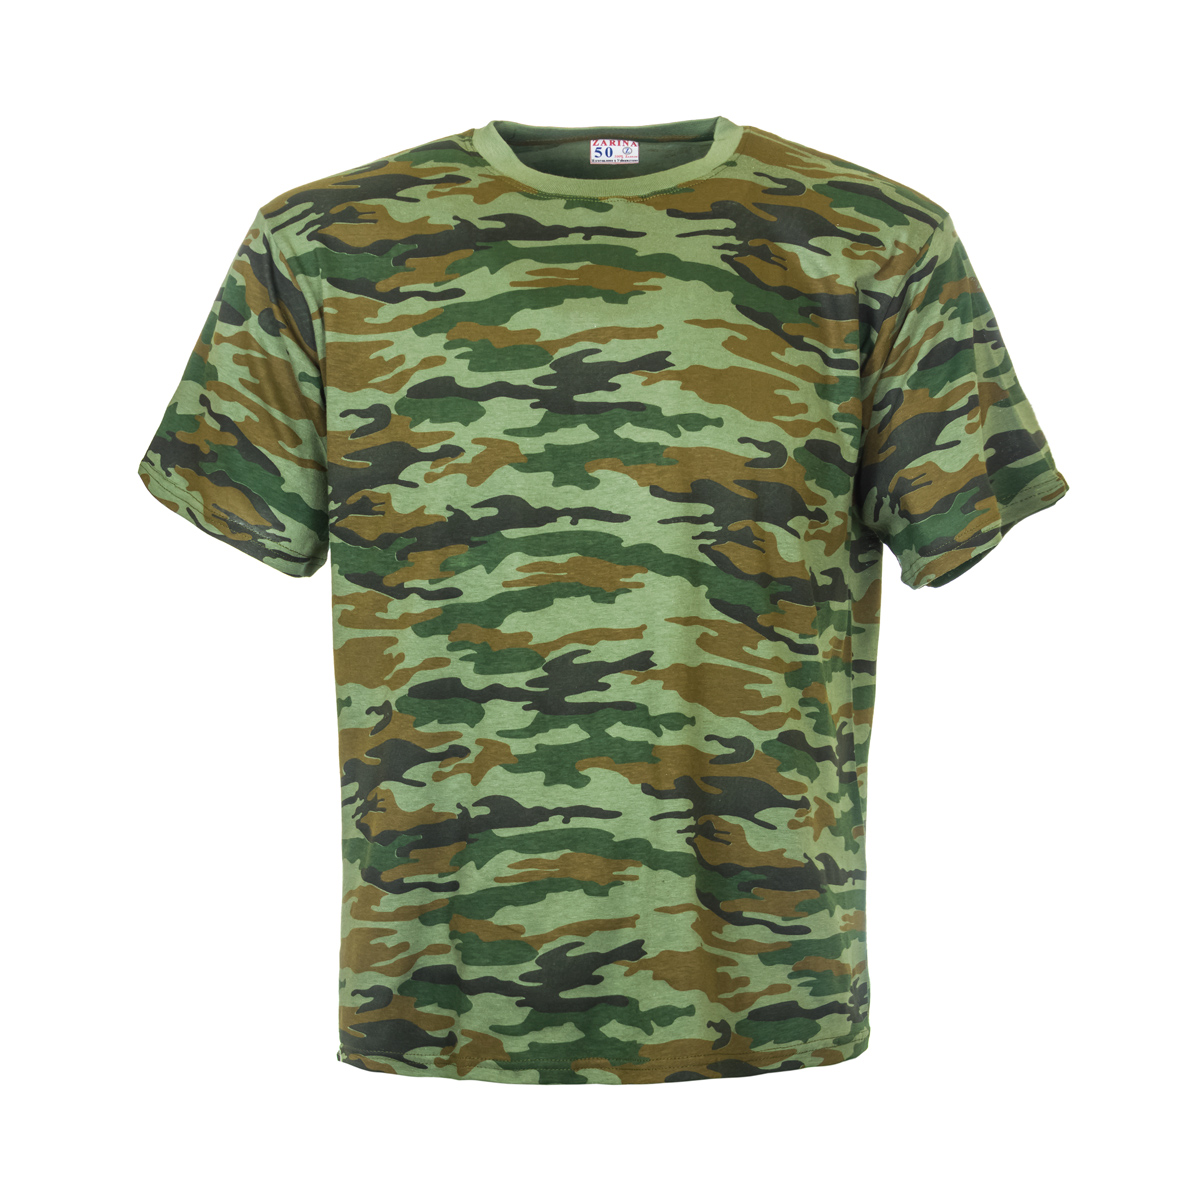 Муж. футболка  Камуфляж  р. 50 - Мужская одежда артикул: 26402